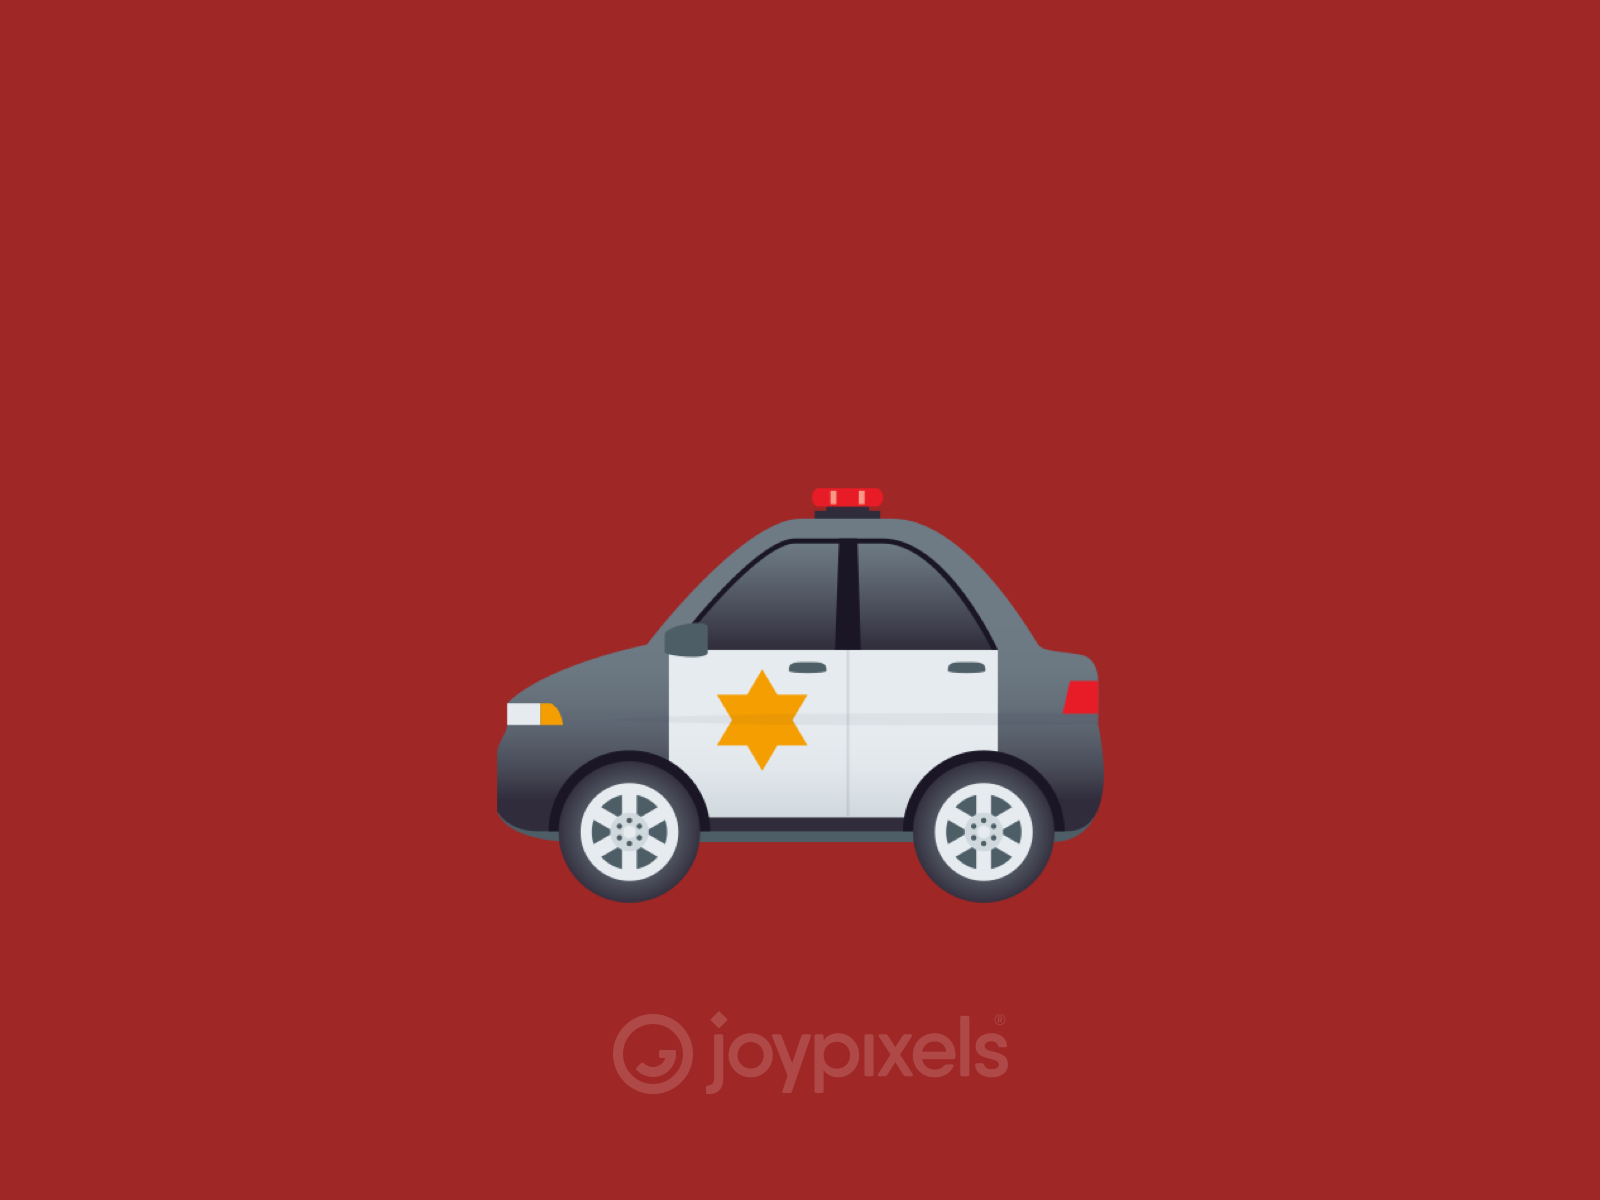 Joypixels Police Car Emoji Emoji Car Emoji Police Cars